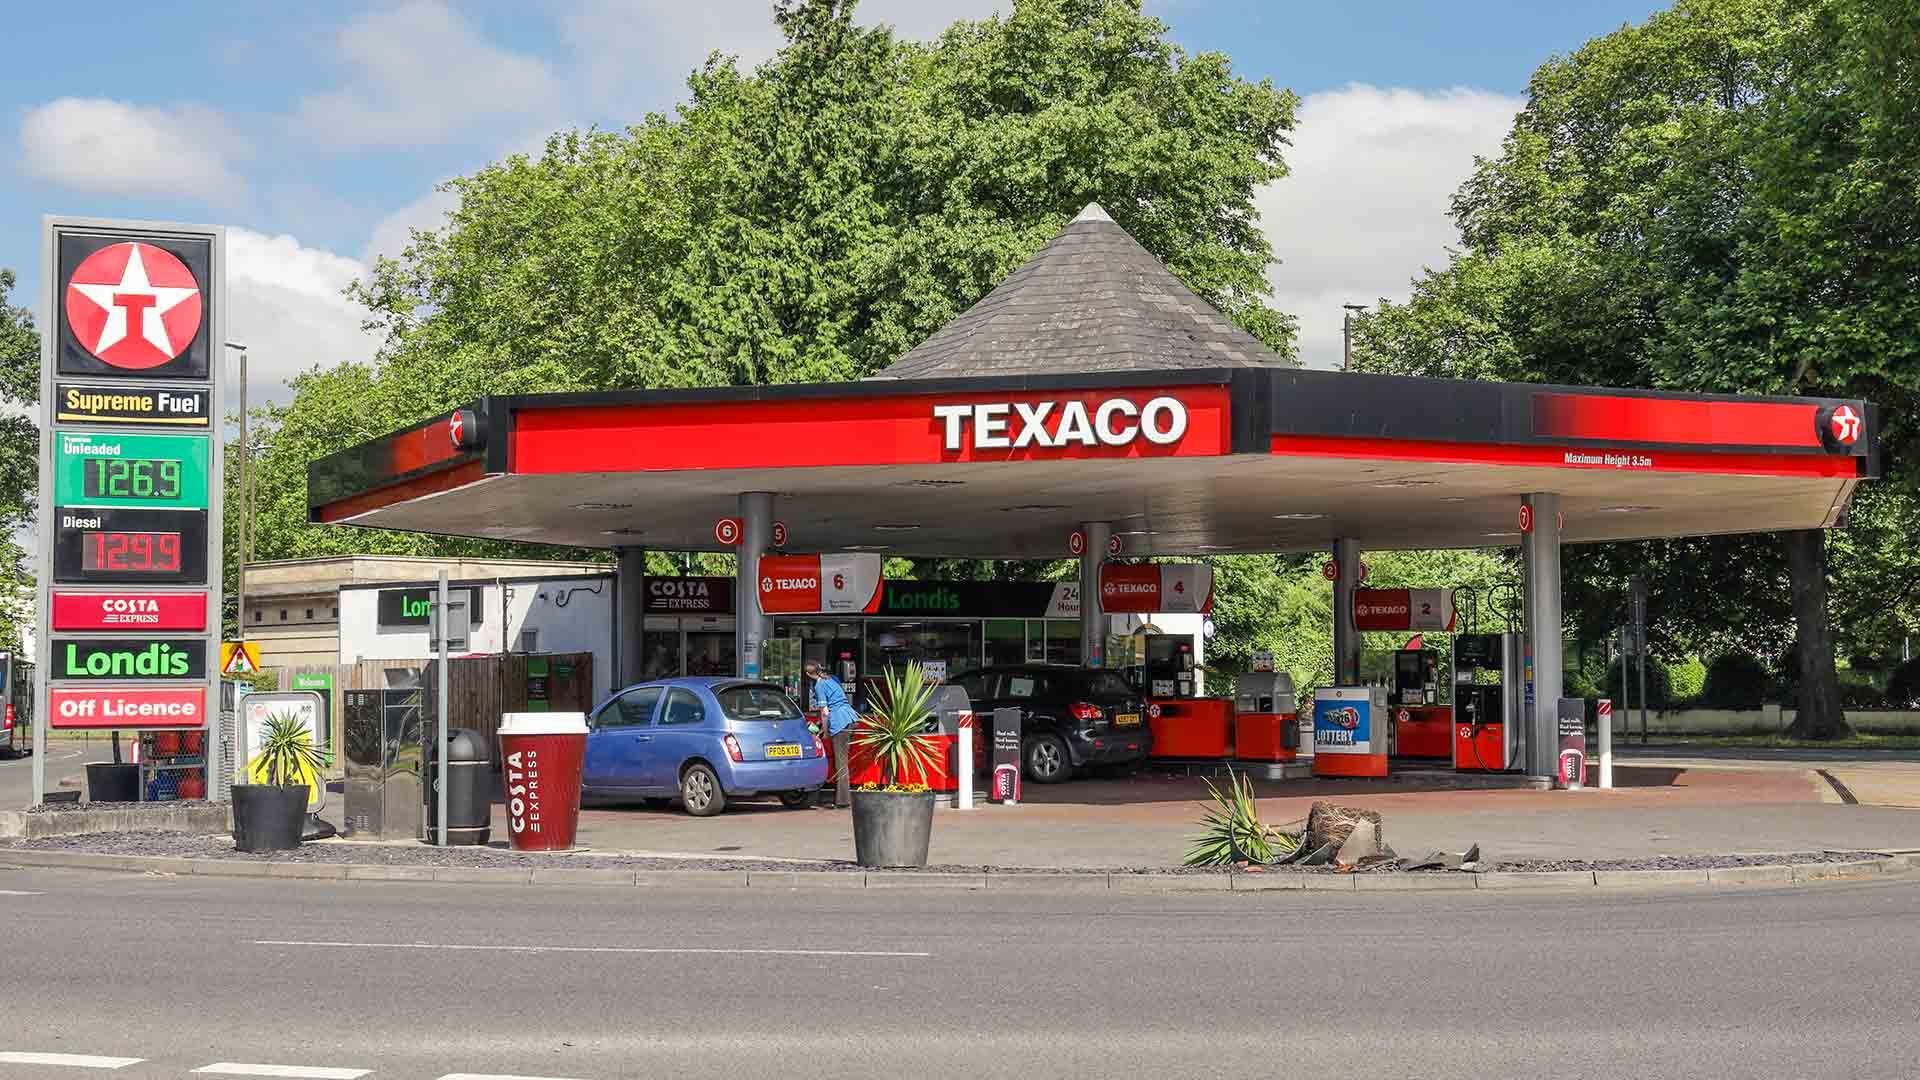 Texaco petrol station